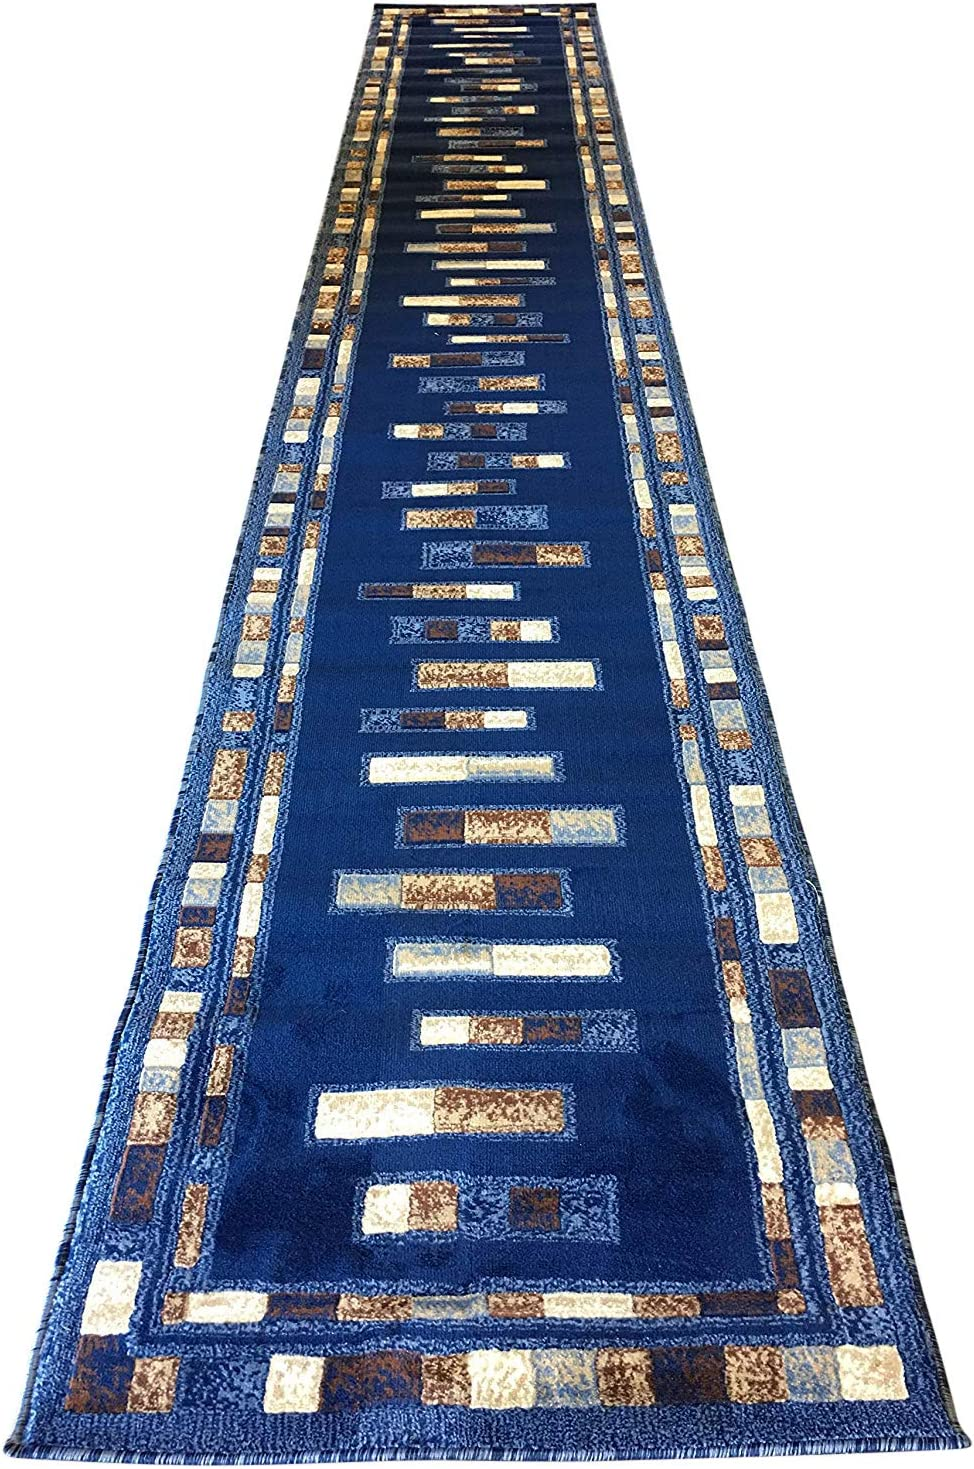 Amazon Com Emirates Modern Long Runner Rug Dark Blue Design 504 31 Inch X 15 Feet 8 Inch Furniture Decor